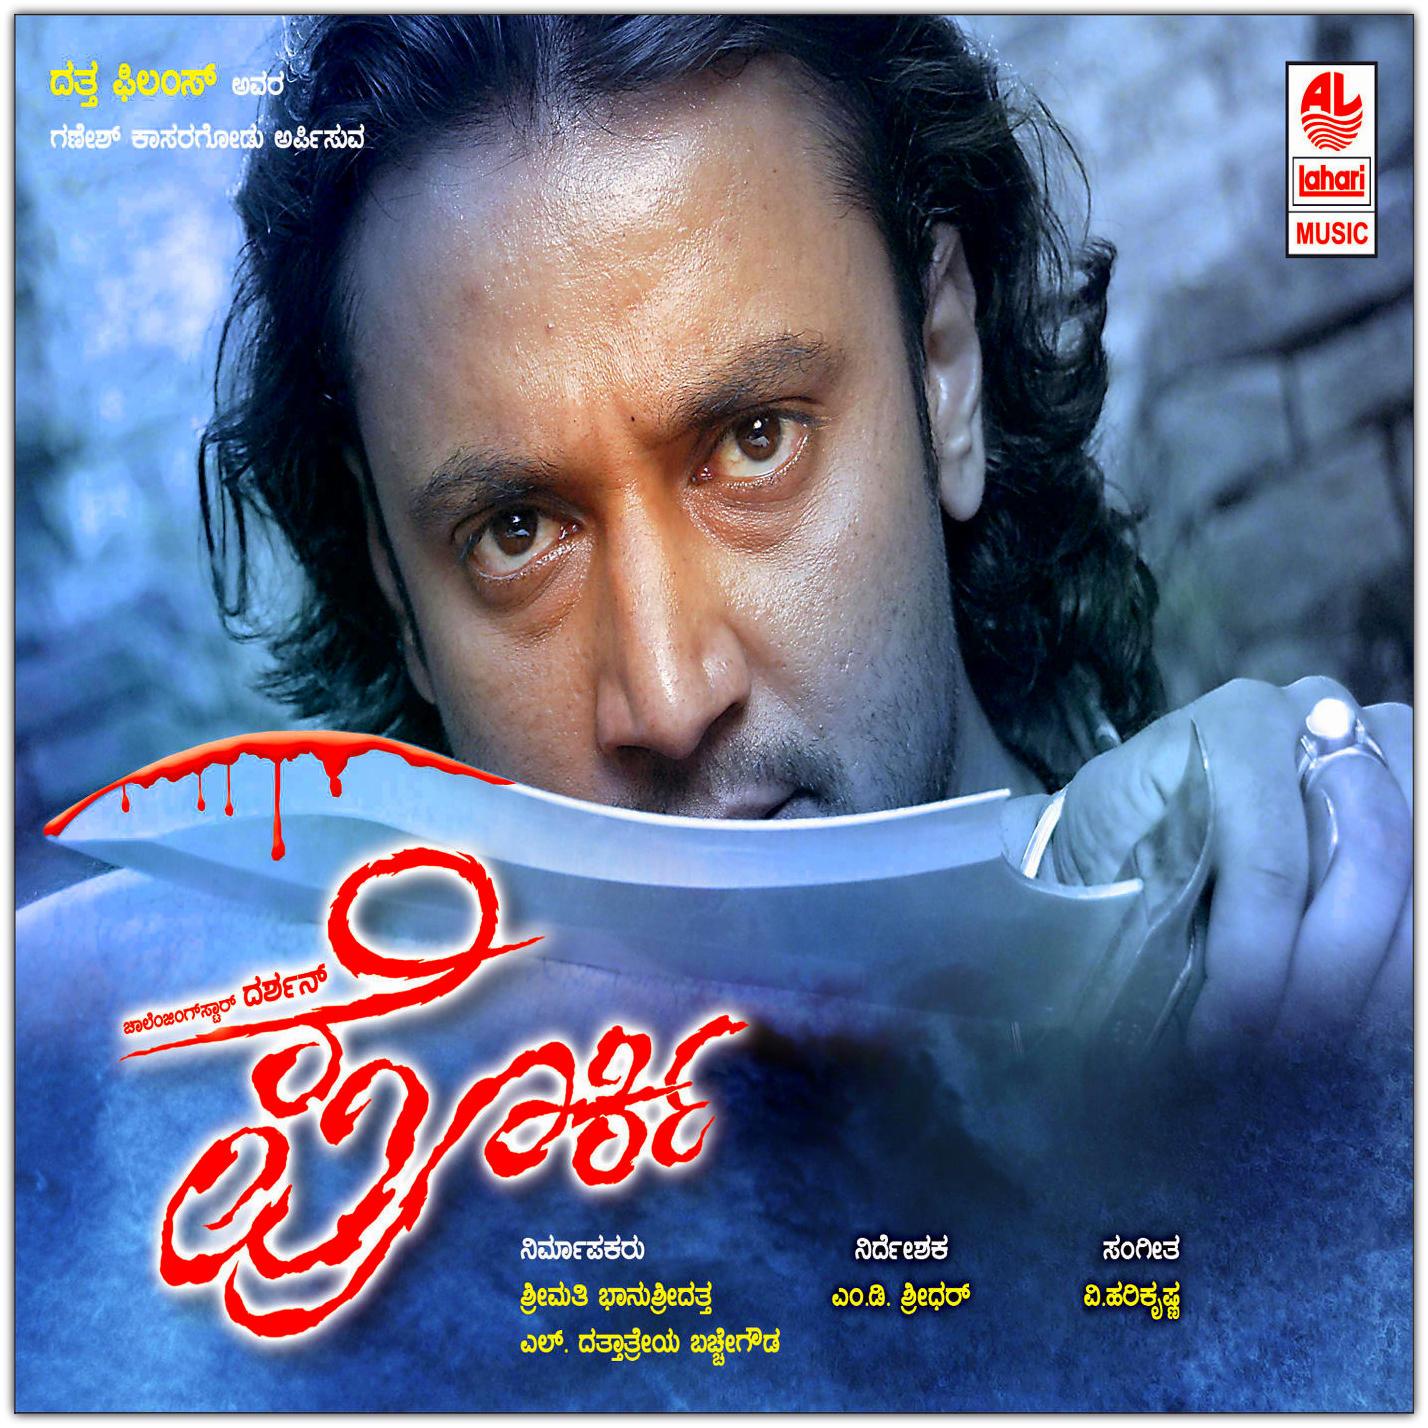 Im Roder Mp3 Song Download: Kannada Mp3 Songs: Porki (2009) Kannada Movie Mp3 Songs